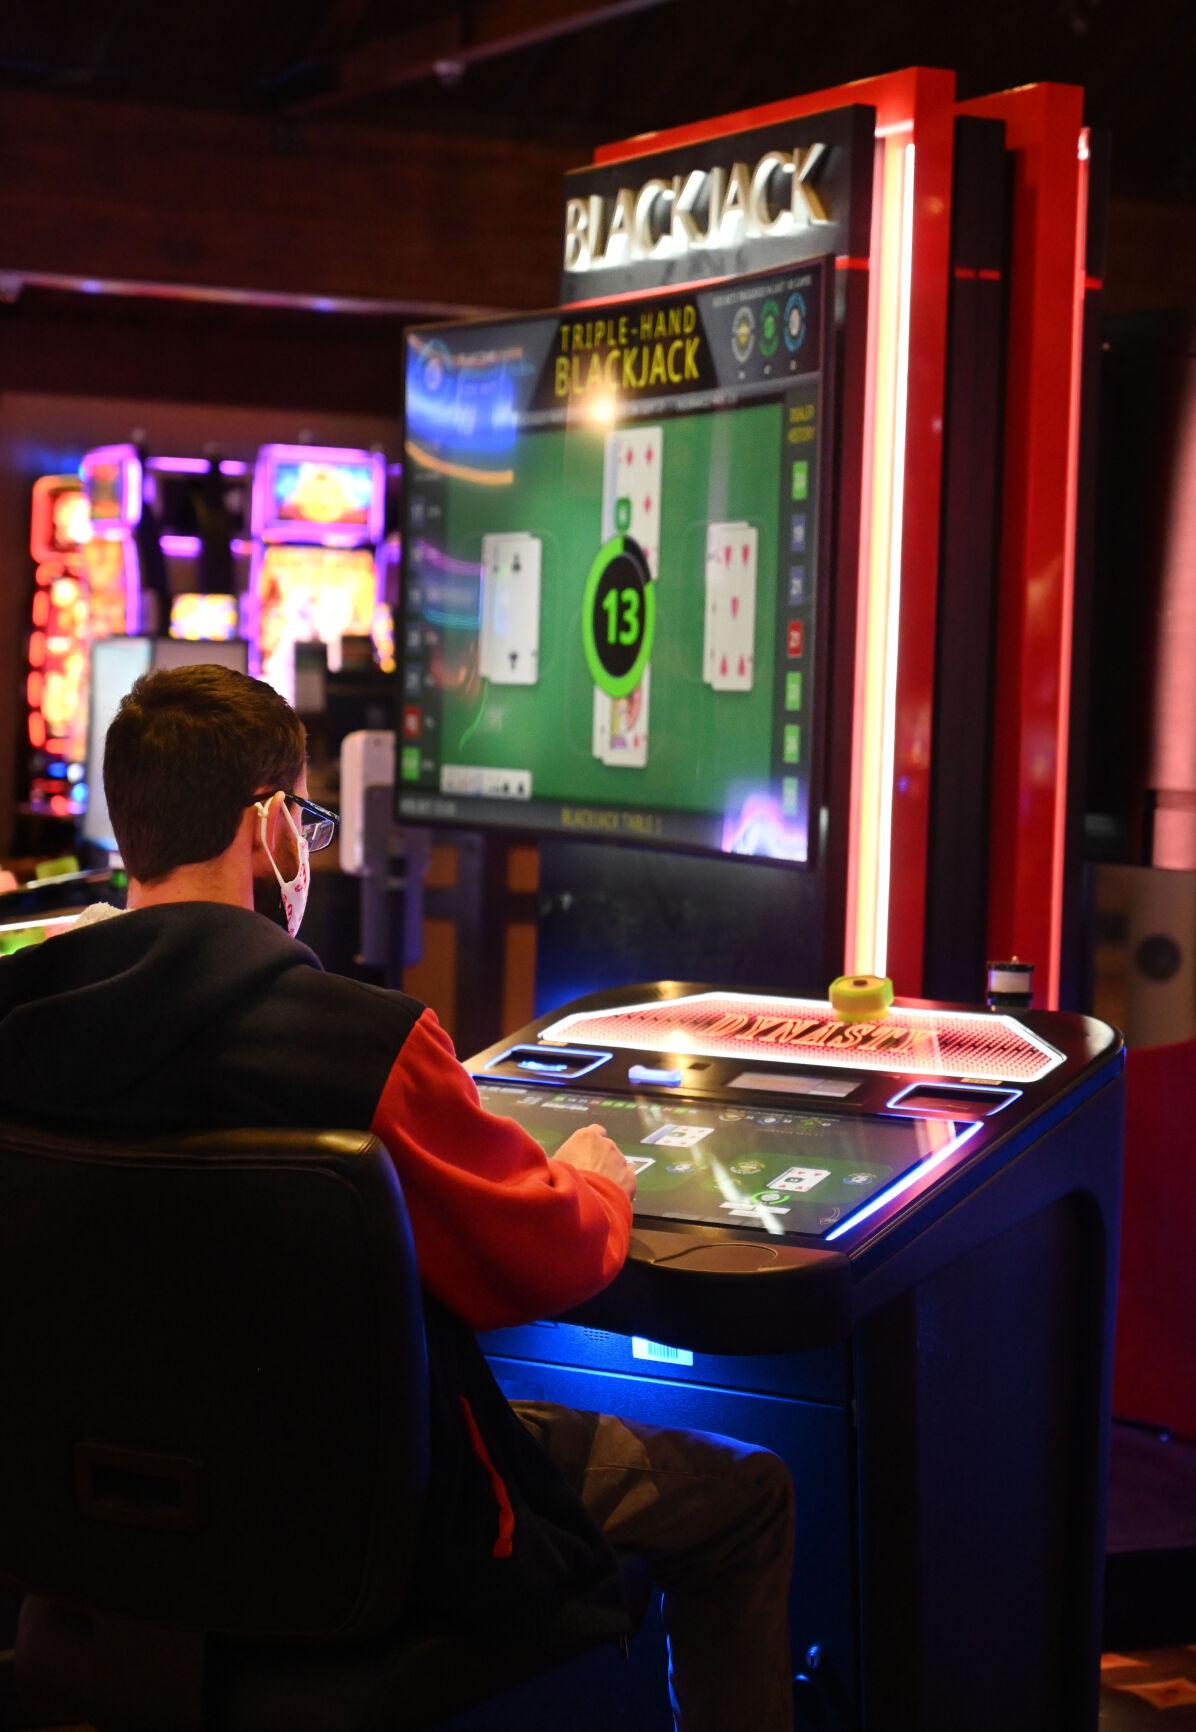 011221-news-gambling 01.jpg